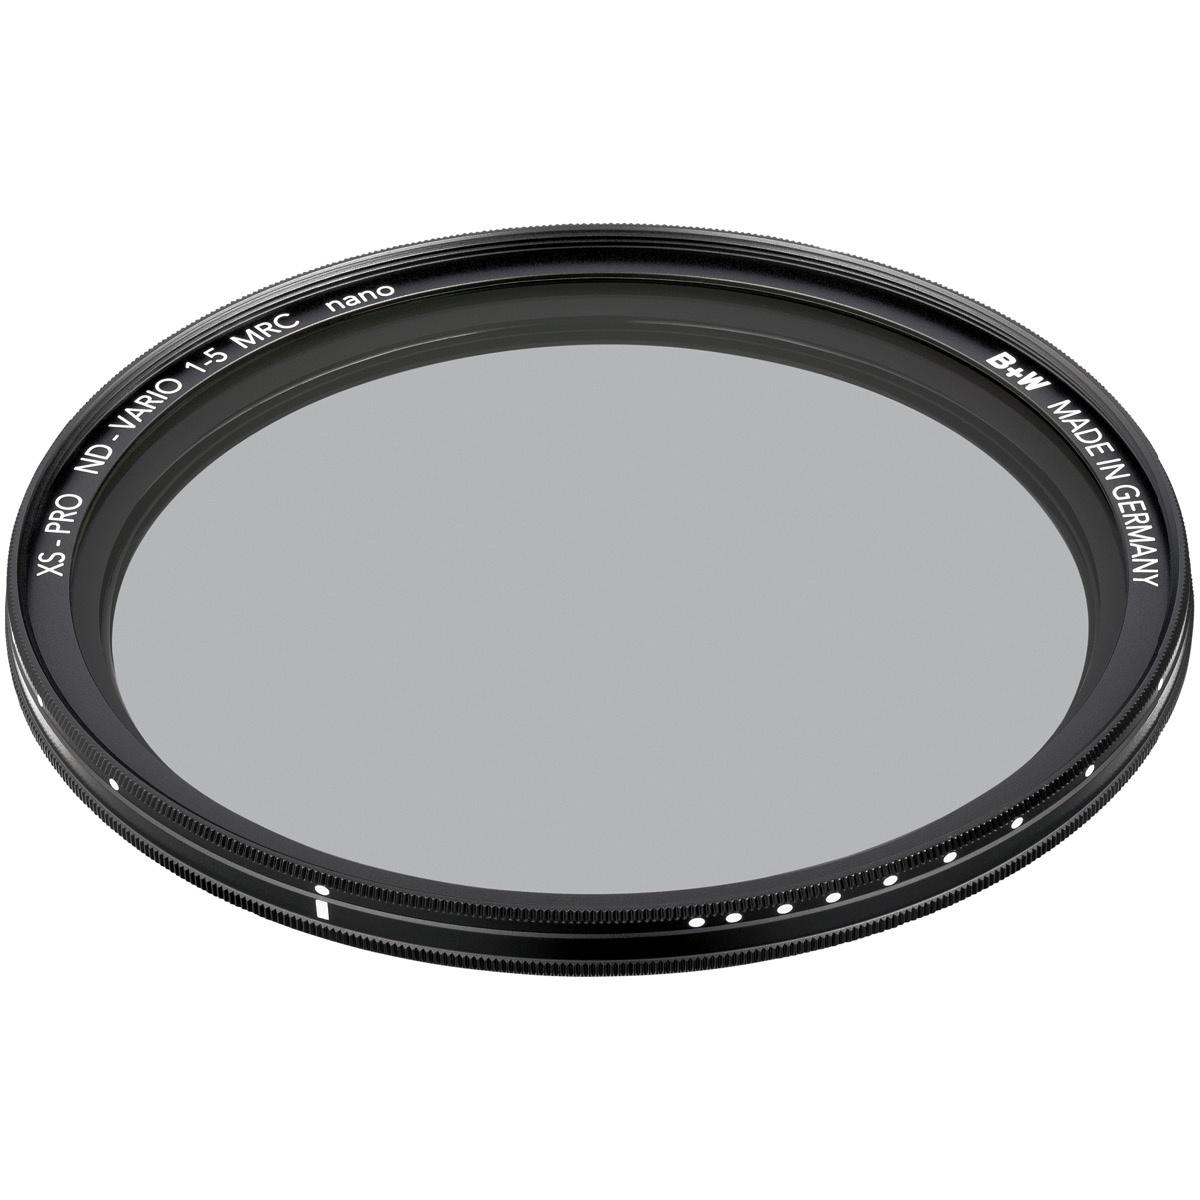 B+W Graufilter 67 mm XS-Pro Vario +1 - +5